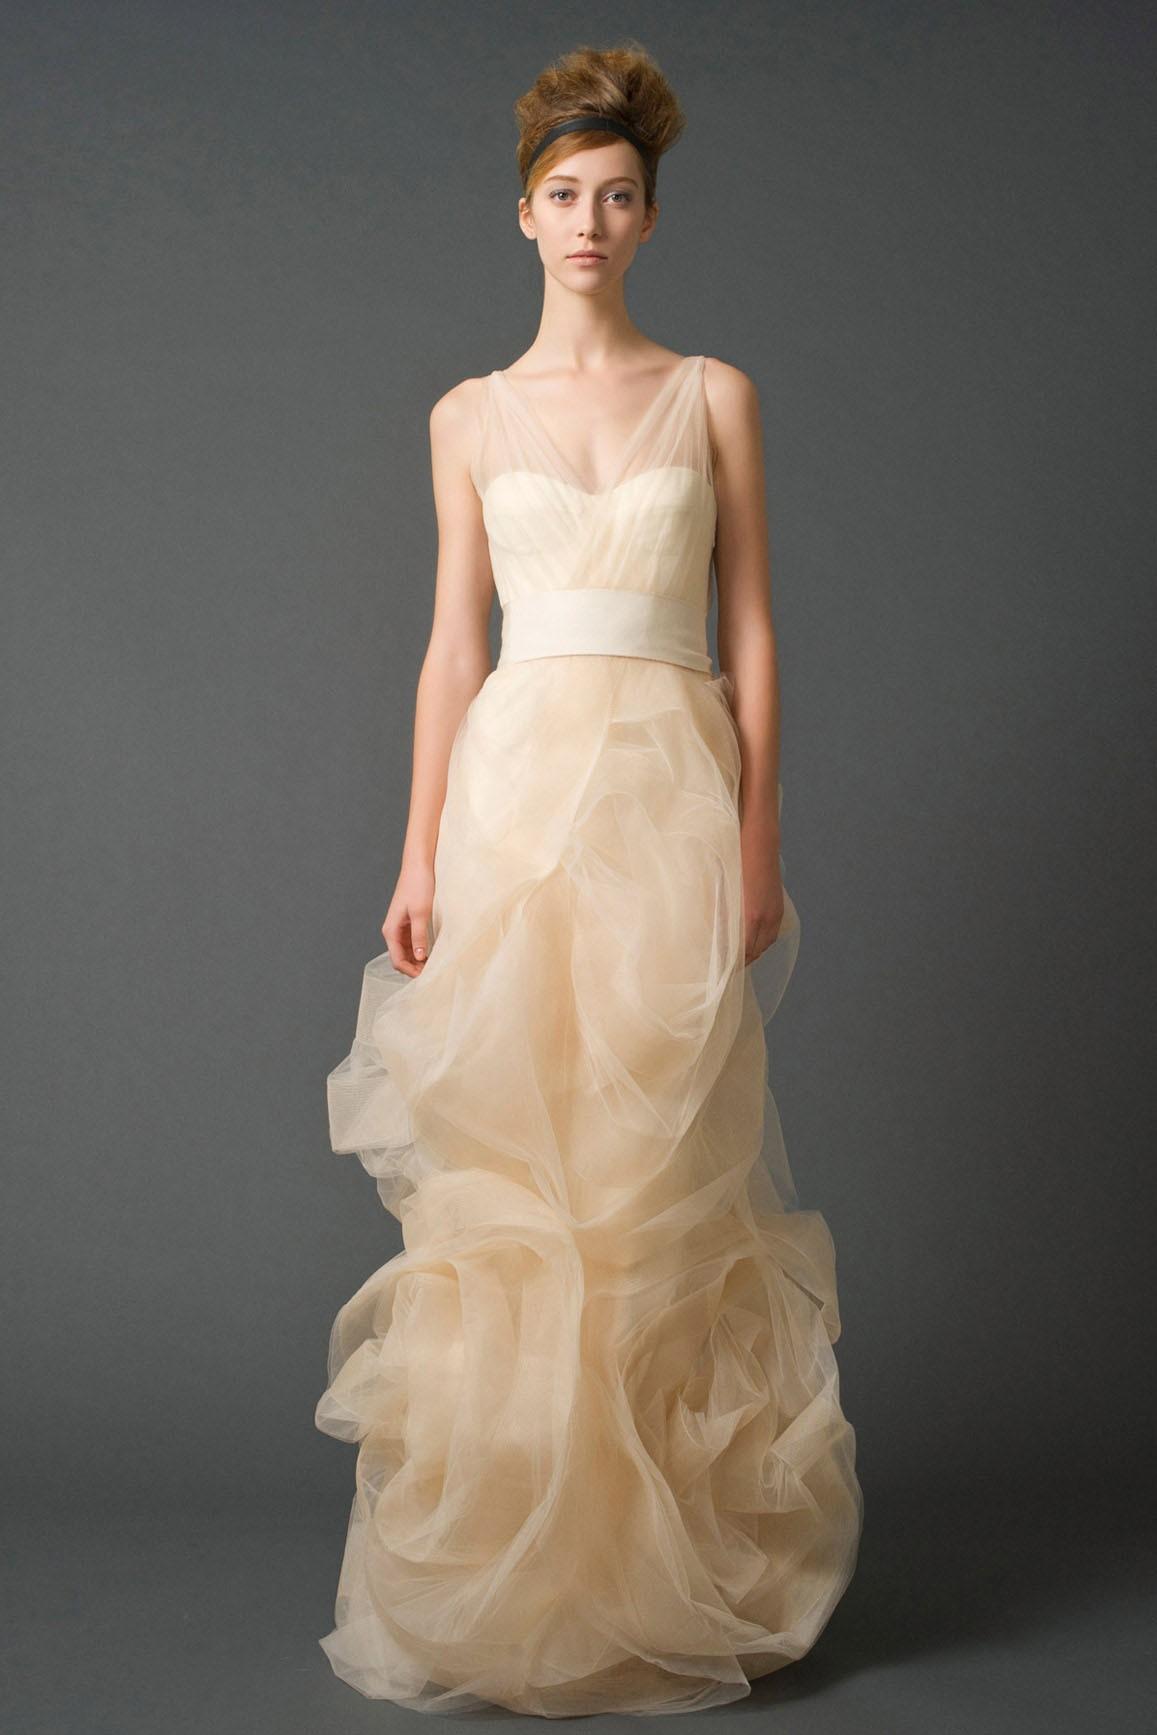 champagne colored dresses champagne colored wedding dresses Champagne Color Dresses